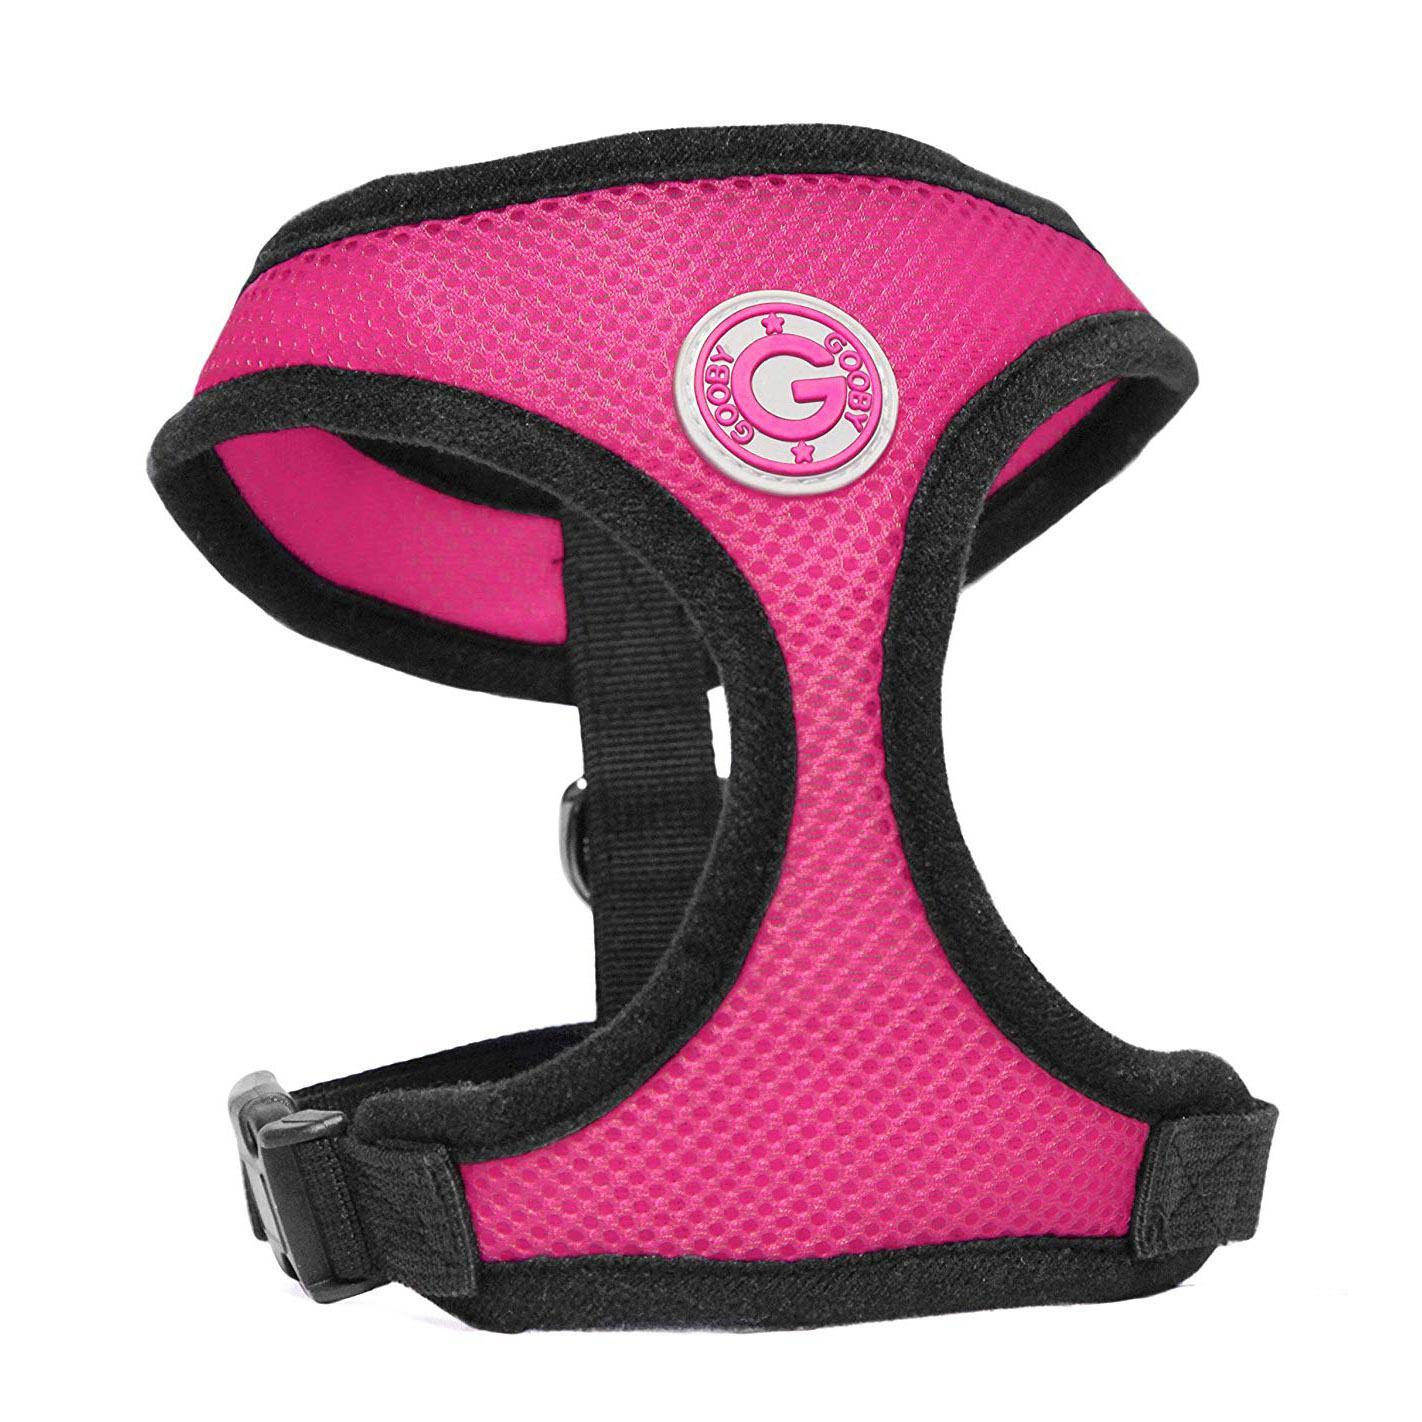 Gooby Soft Mesh Dog Harness - Flamingo Pink